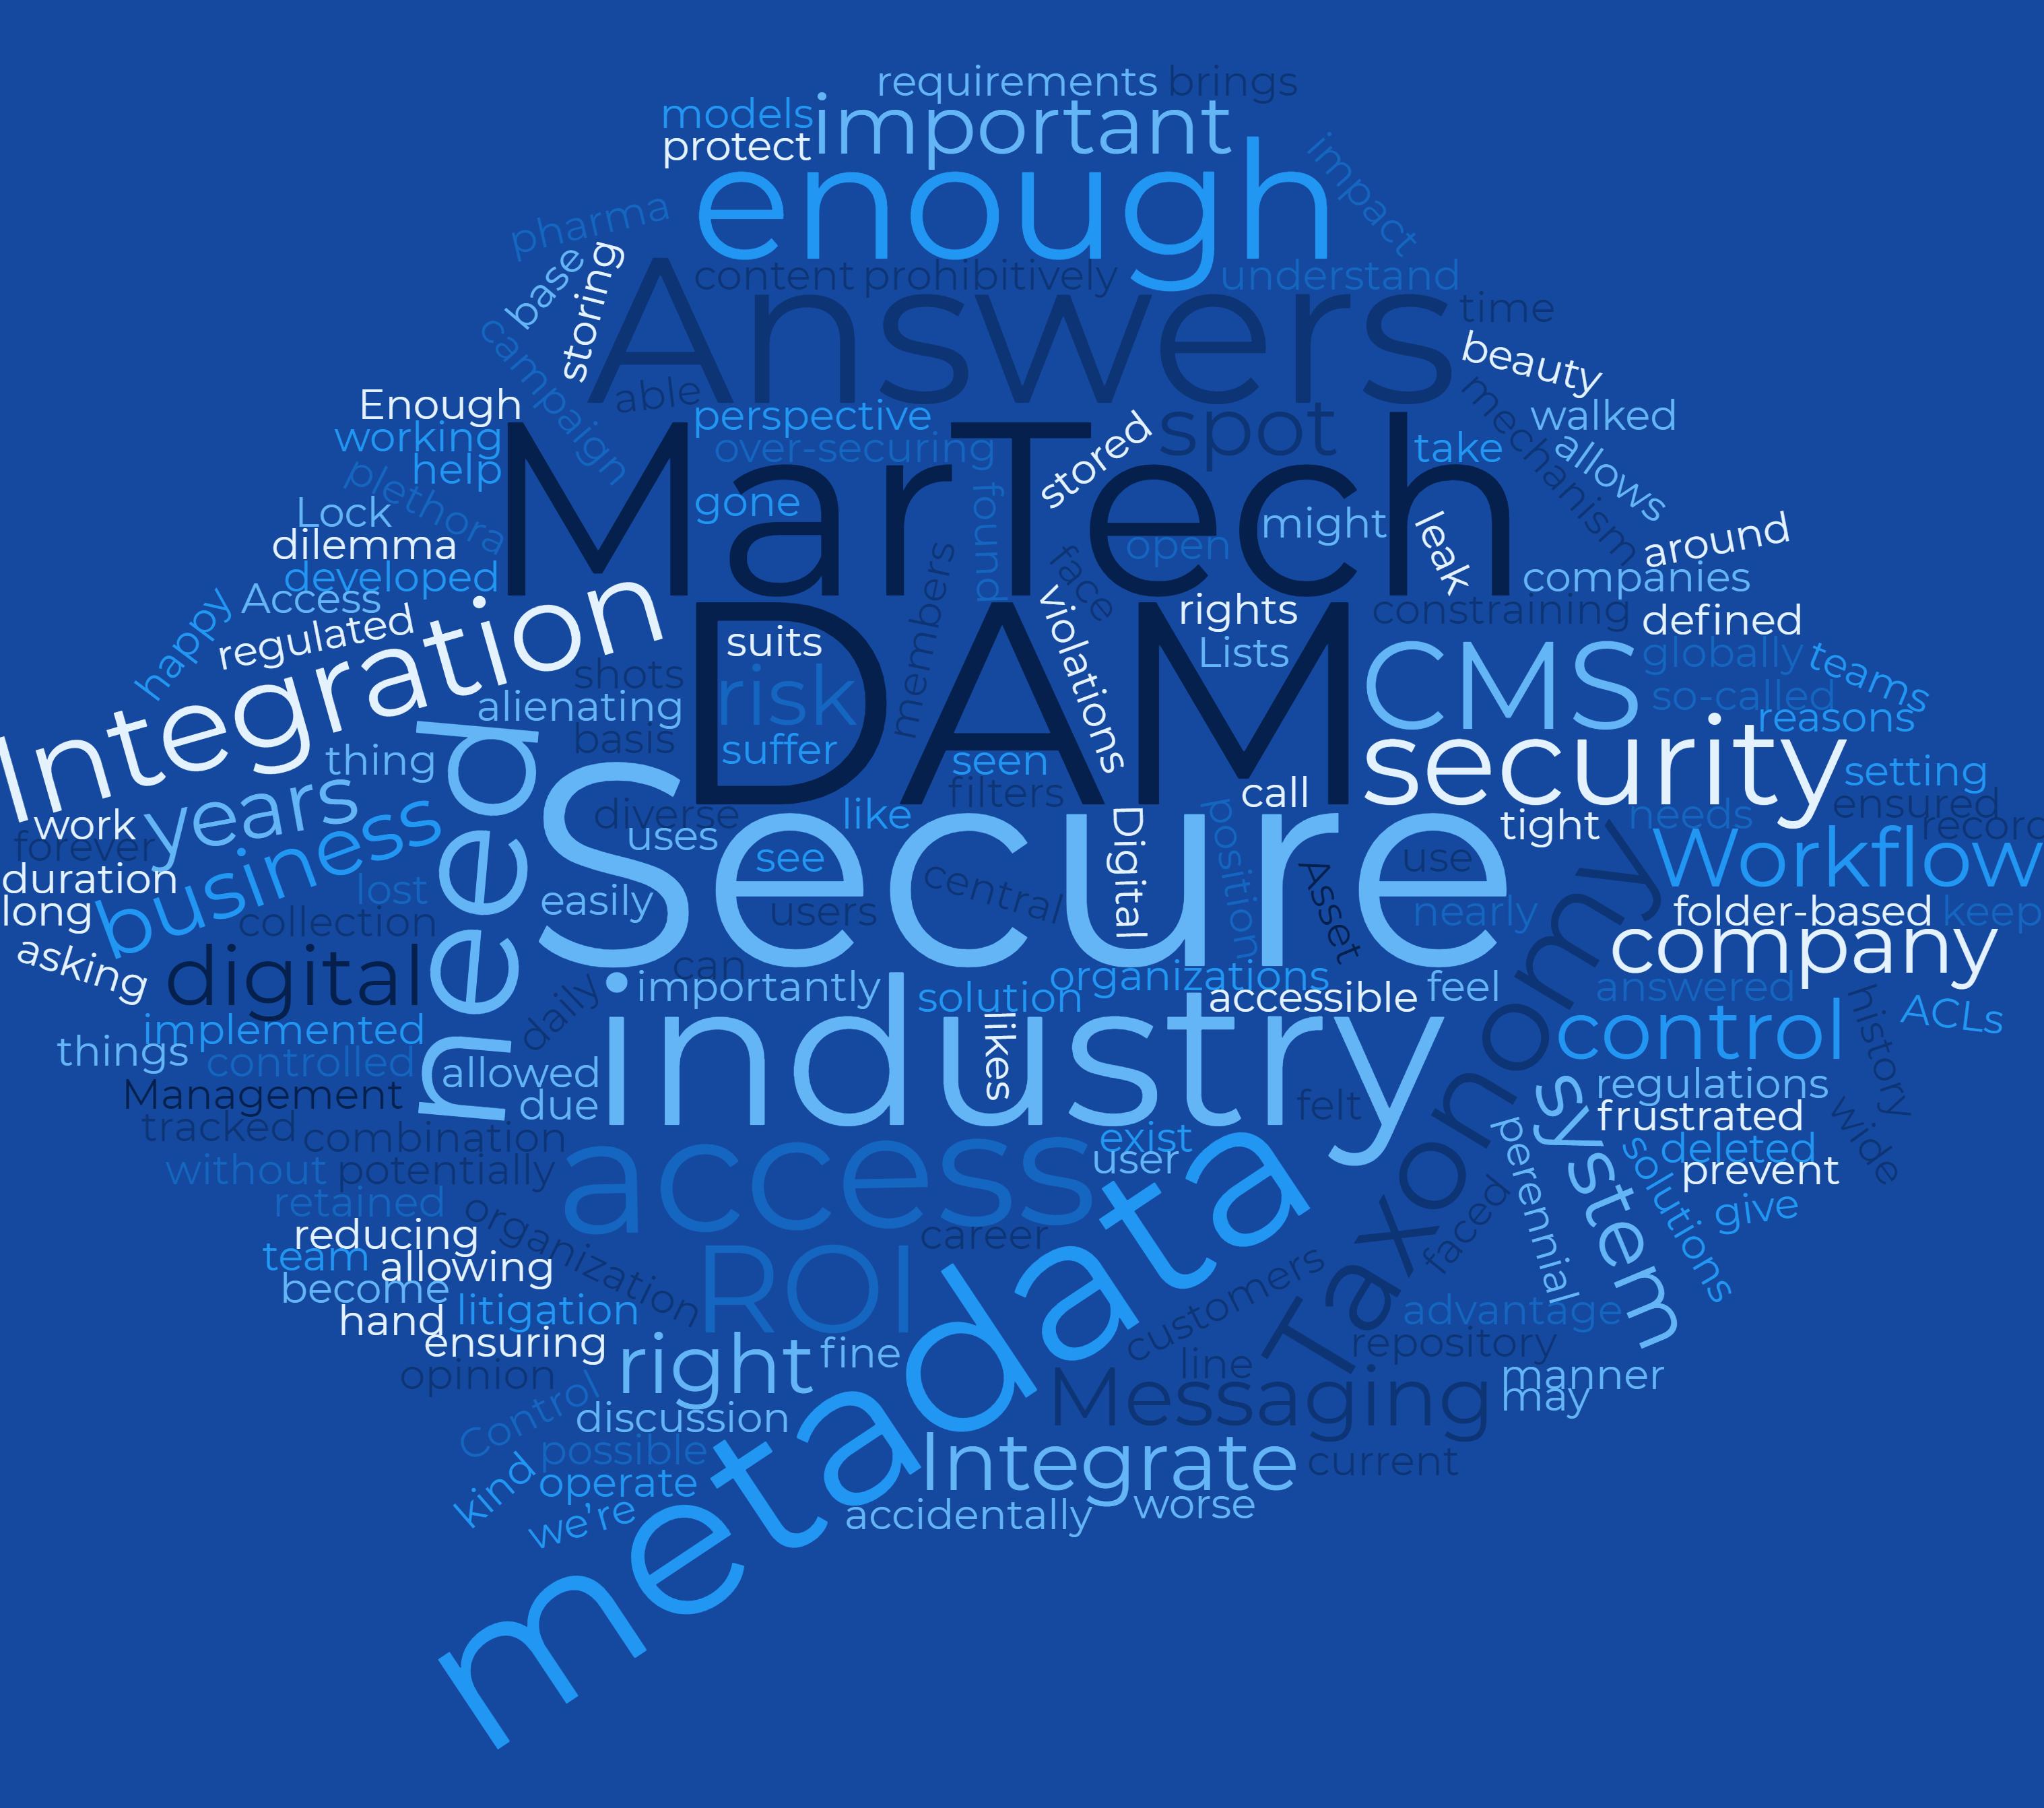 DAMGeeks - Digital Asset Management Experts - Word Cloud